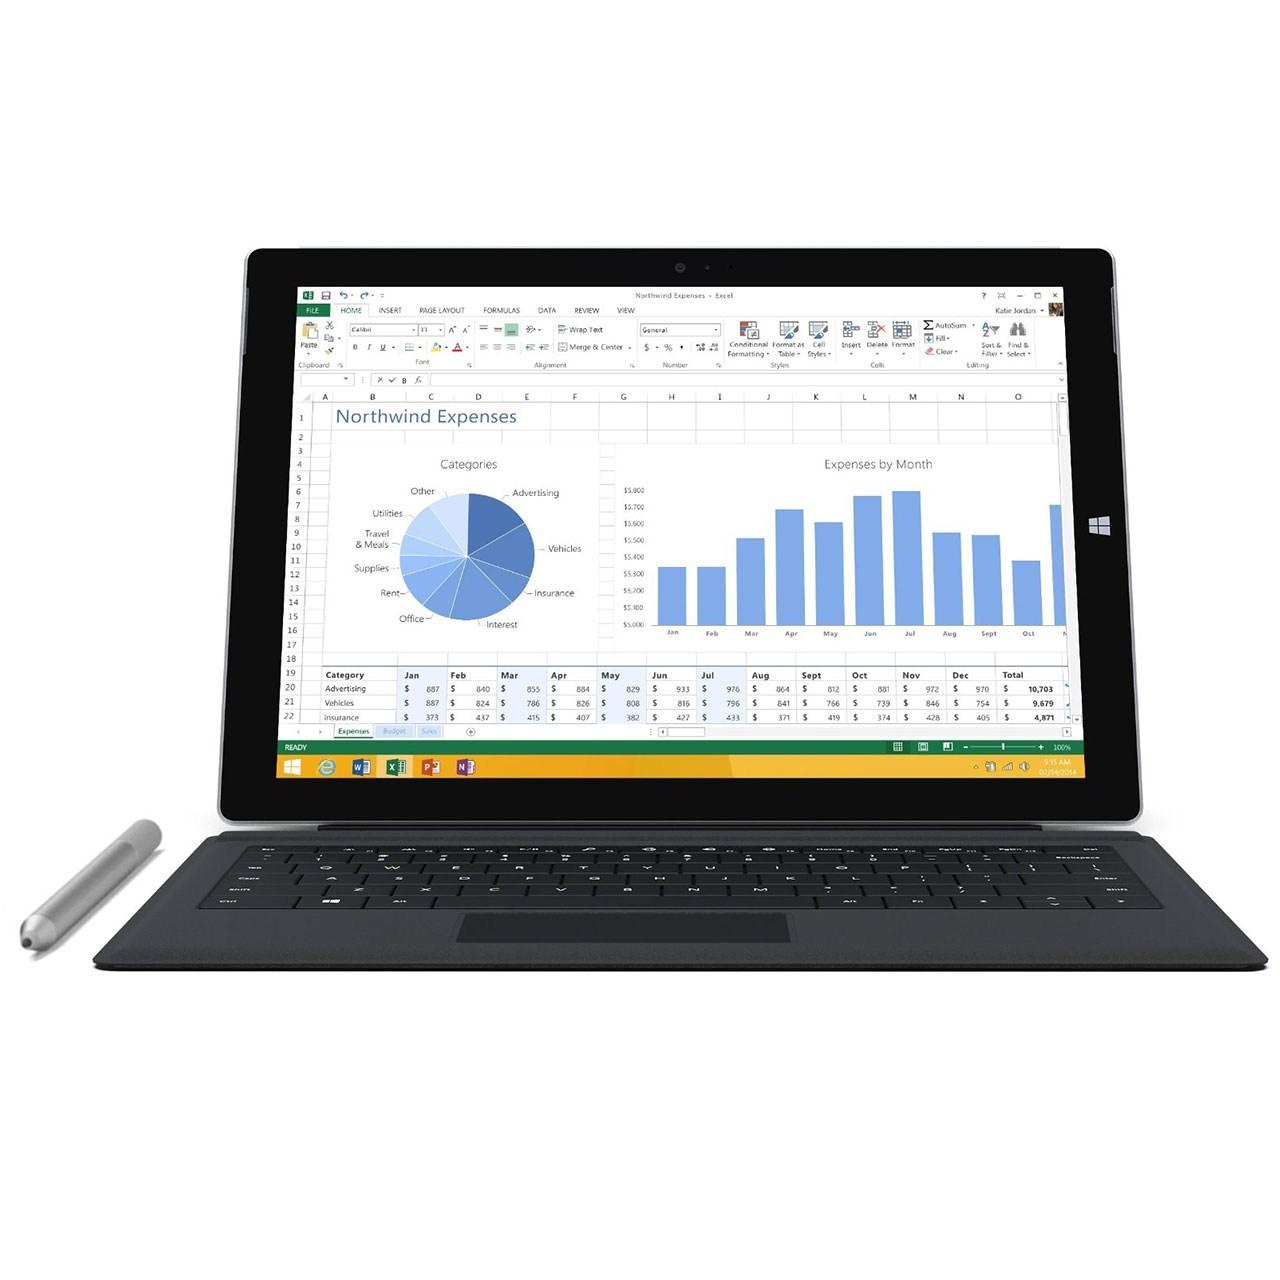 تبلت مايکروسافت مدل Surface Pro 3 - A به همراه کيبورد ظرفيت 256 گيگابايت